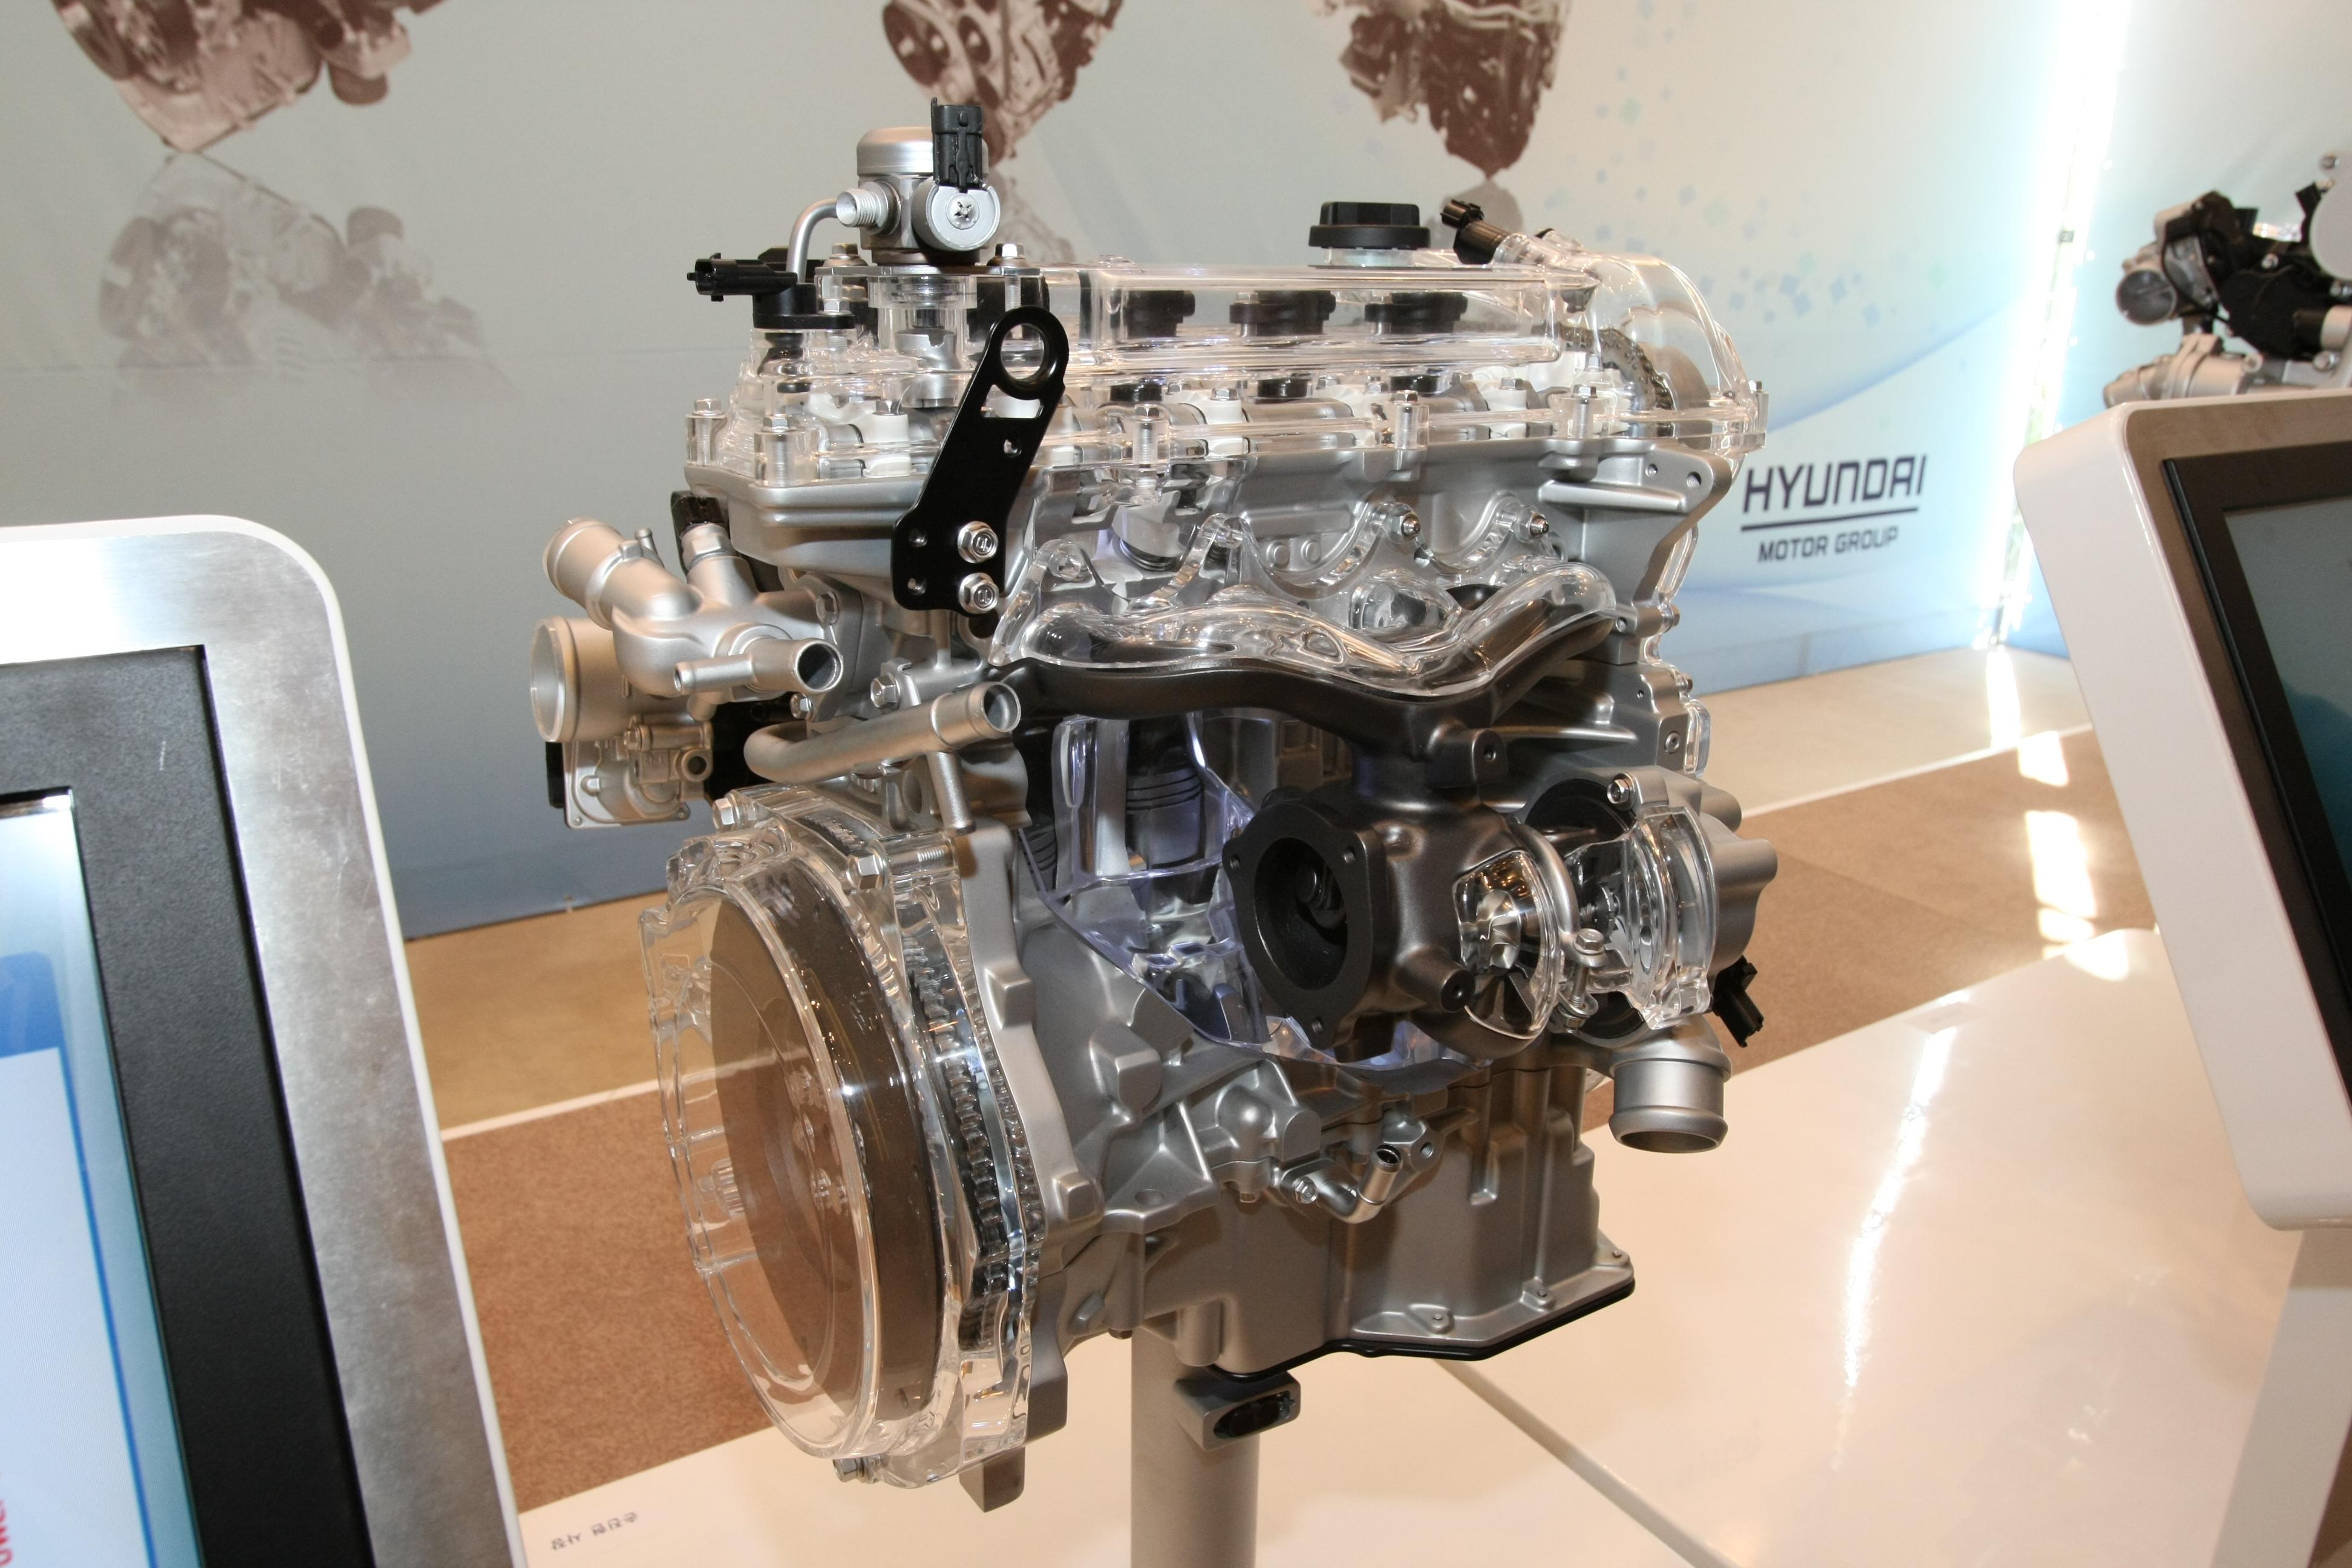 Gamma 1 6 T - GDI Engine (1) - Hyundai Motor Company